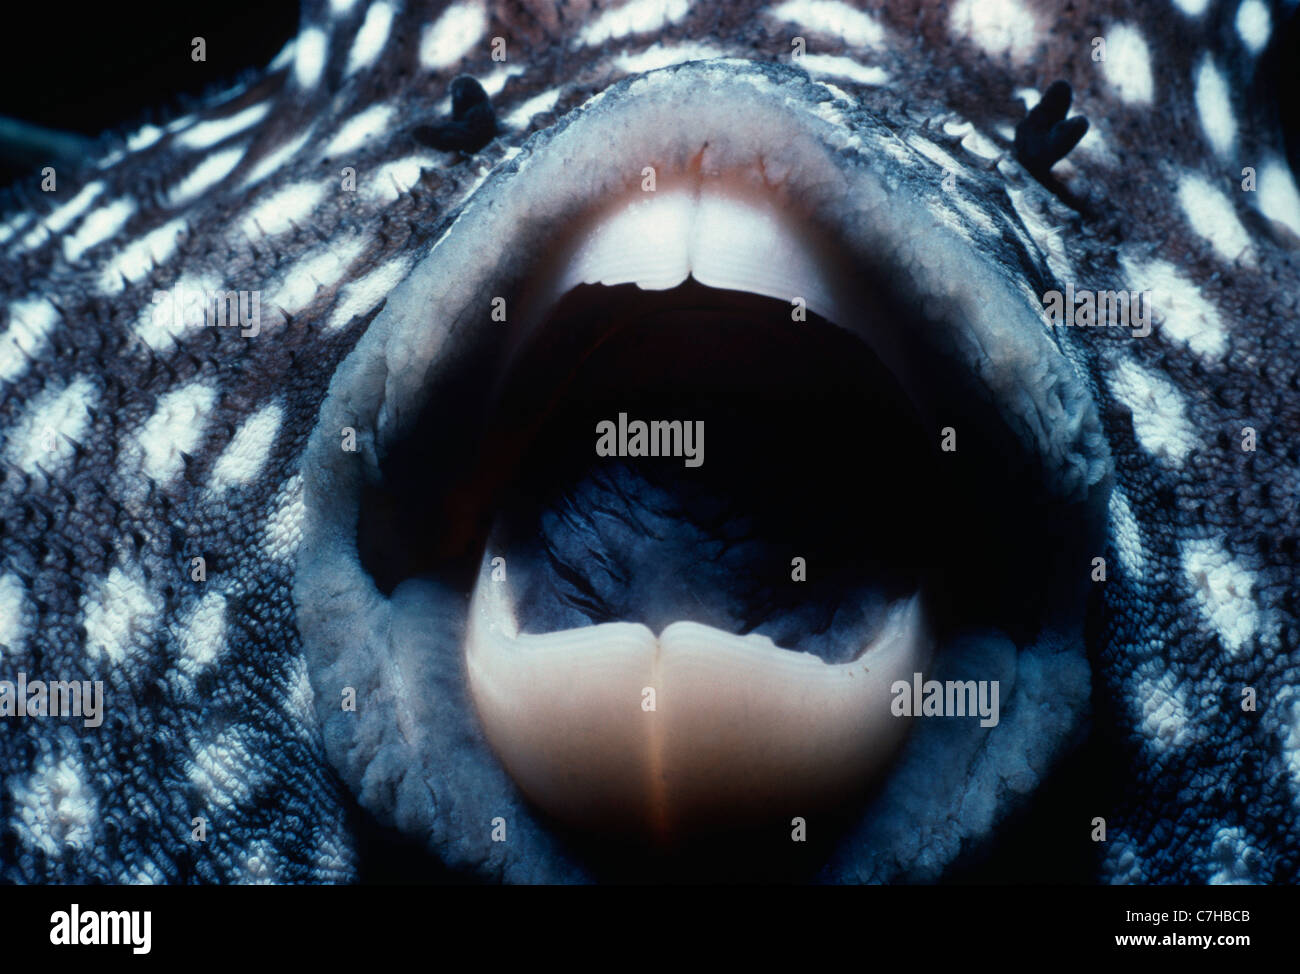 Guineafowl Pufferfish (Arothron meleagris), Cocos Island, Costa Rica - Pacific Ocean Stock Photo